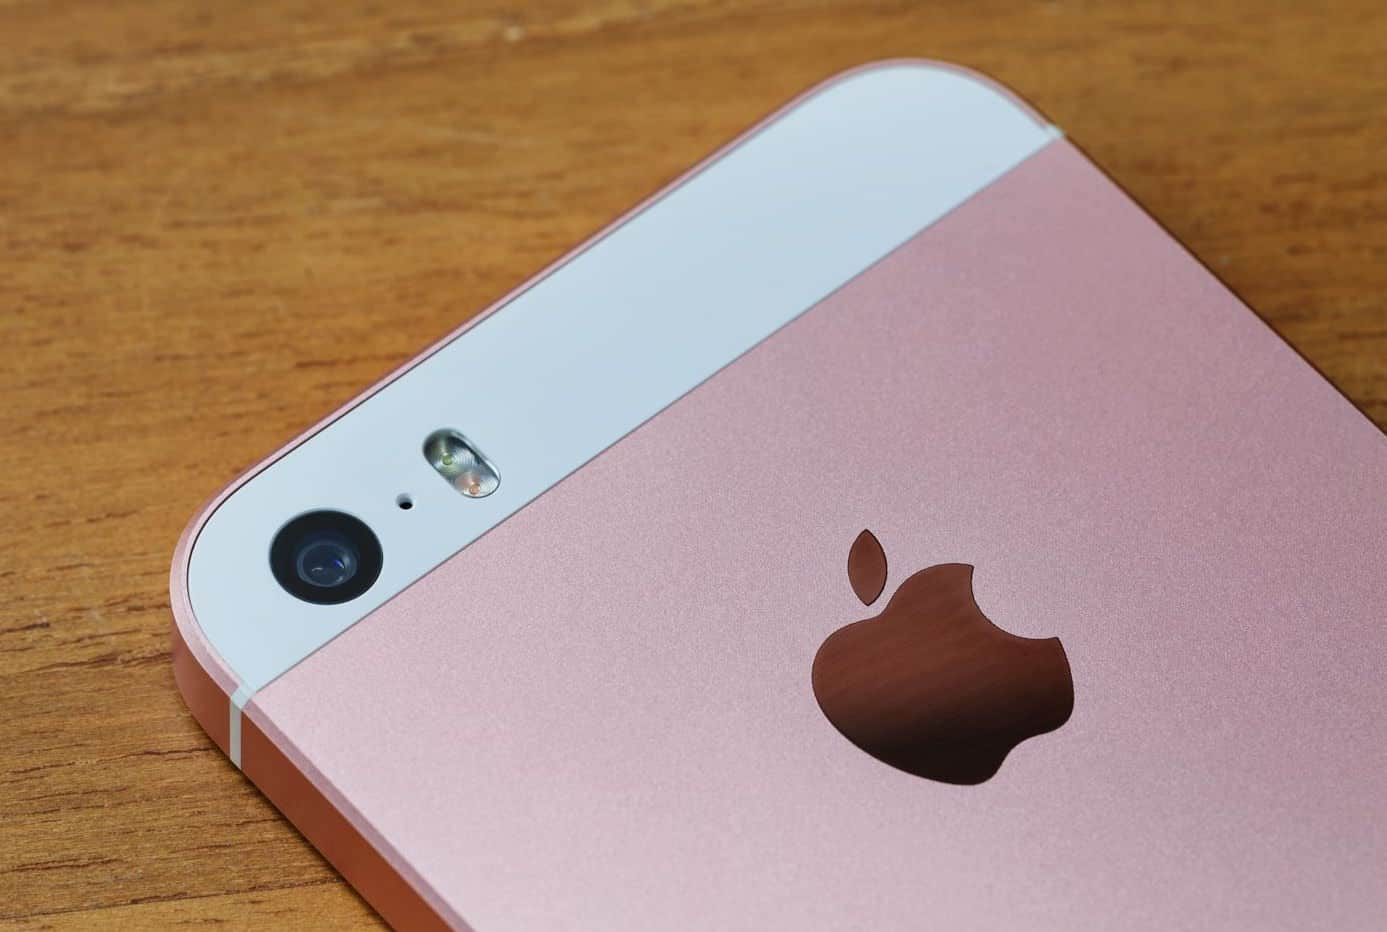 Apple iPhone SE vs. iPhone 6s Plus test Review 2